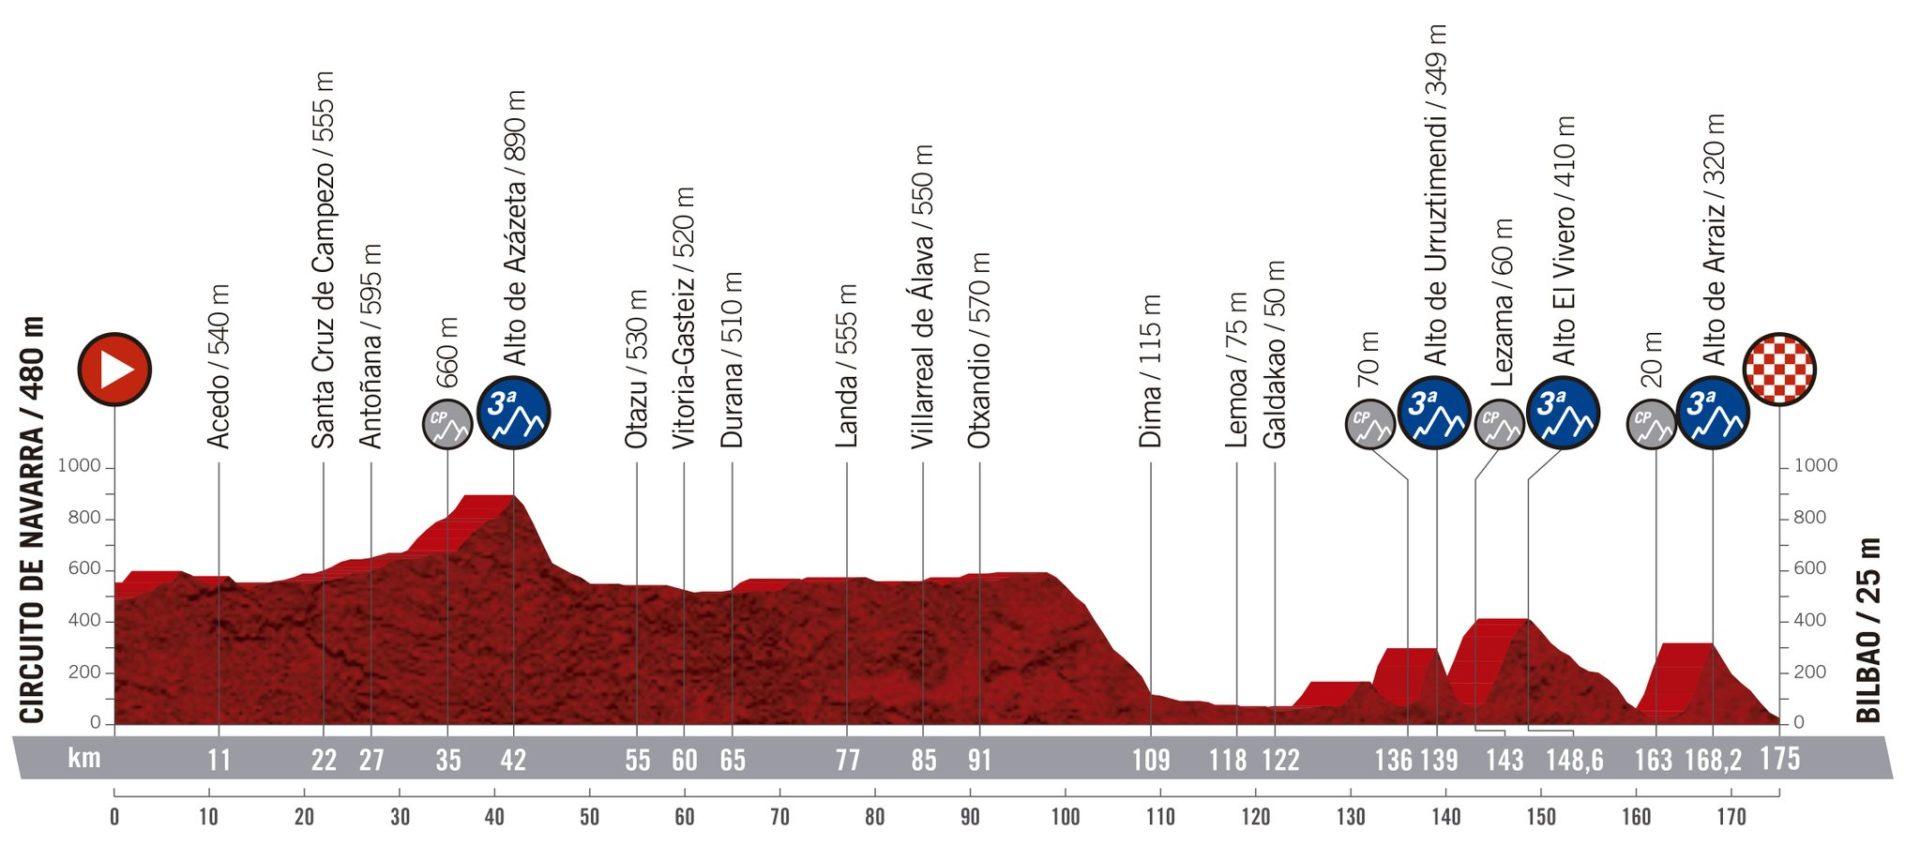 Circuito de Navarra - Bilbao. La Vuelta 2019